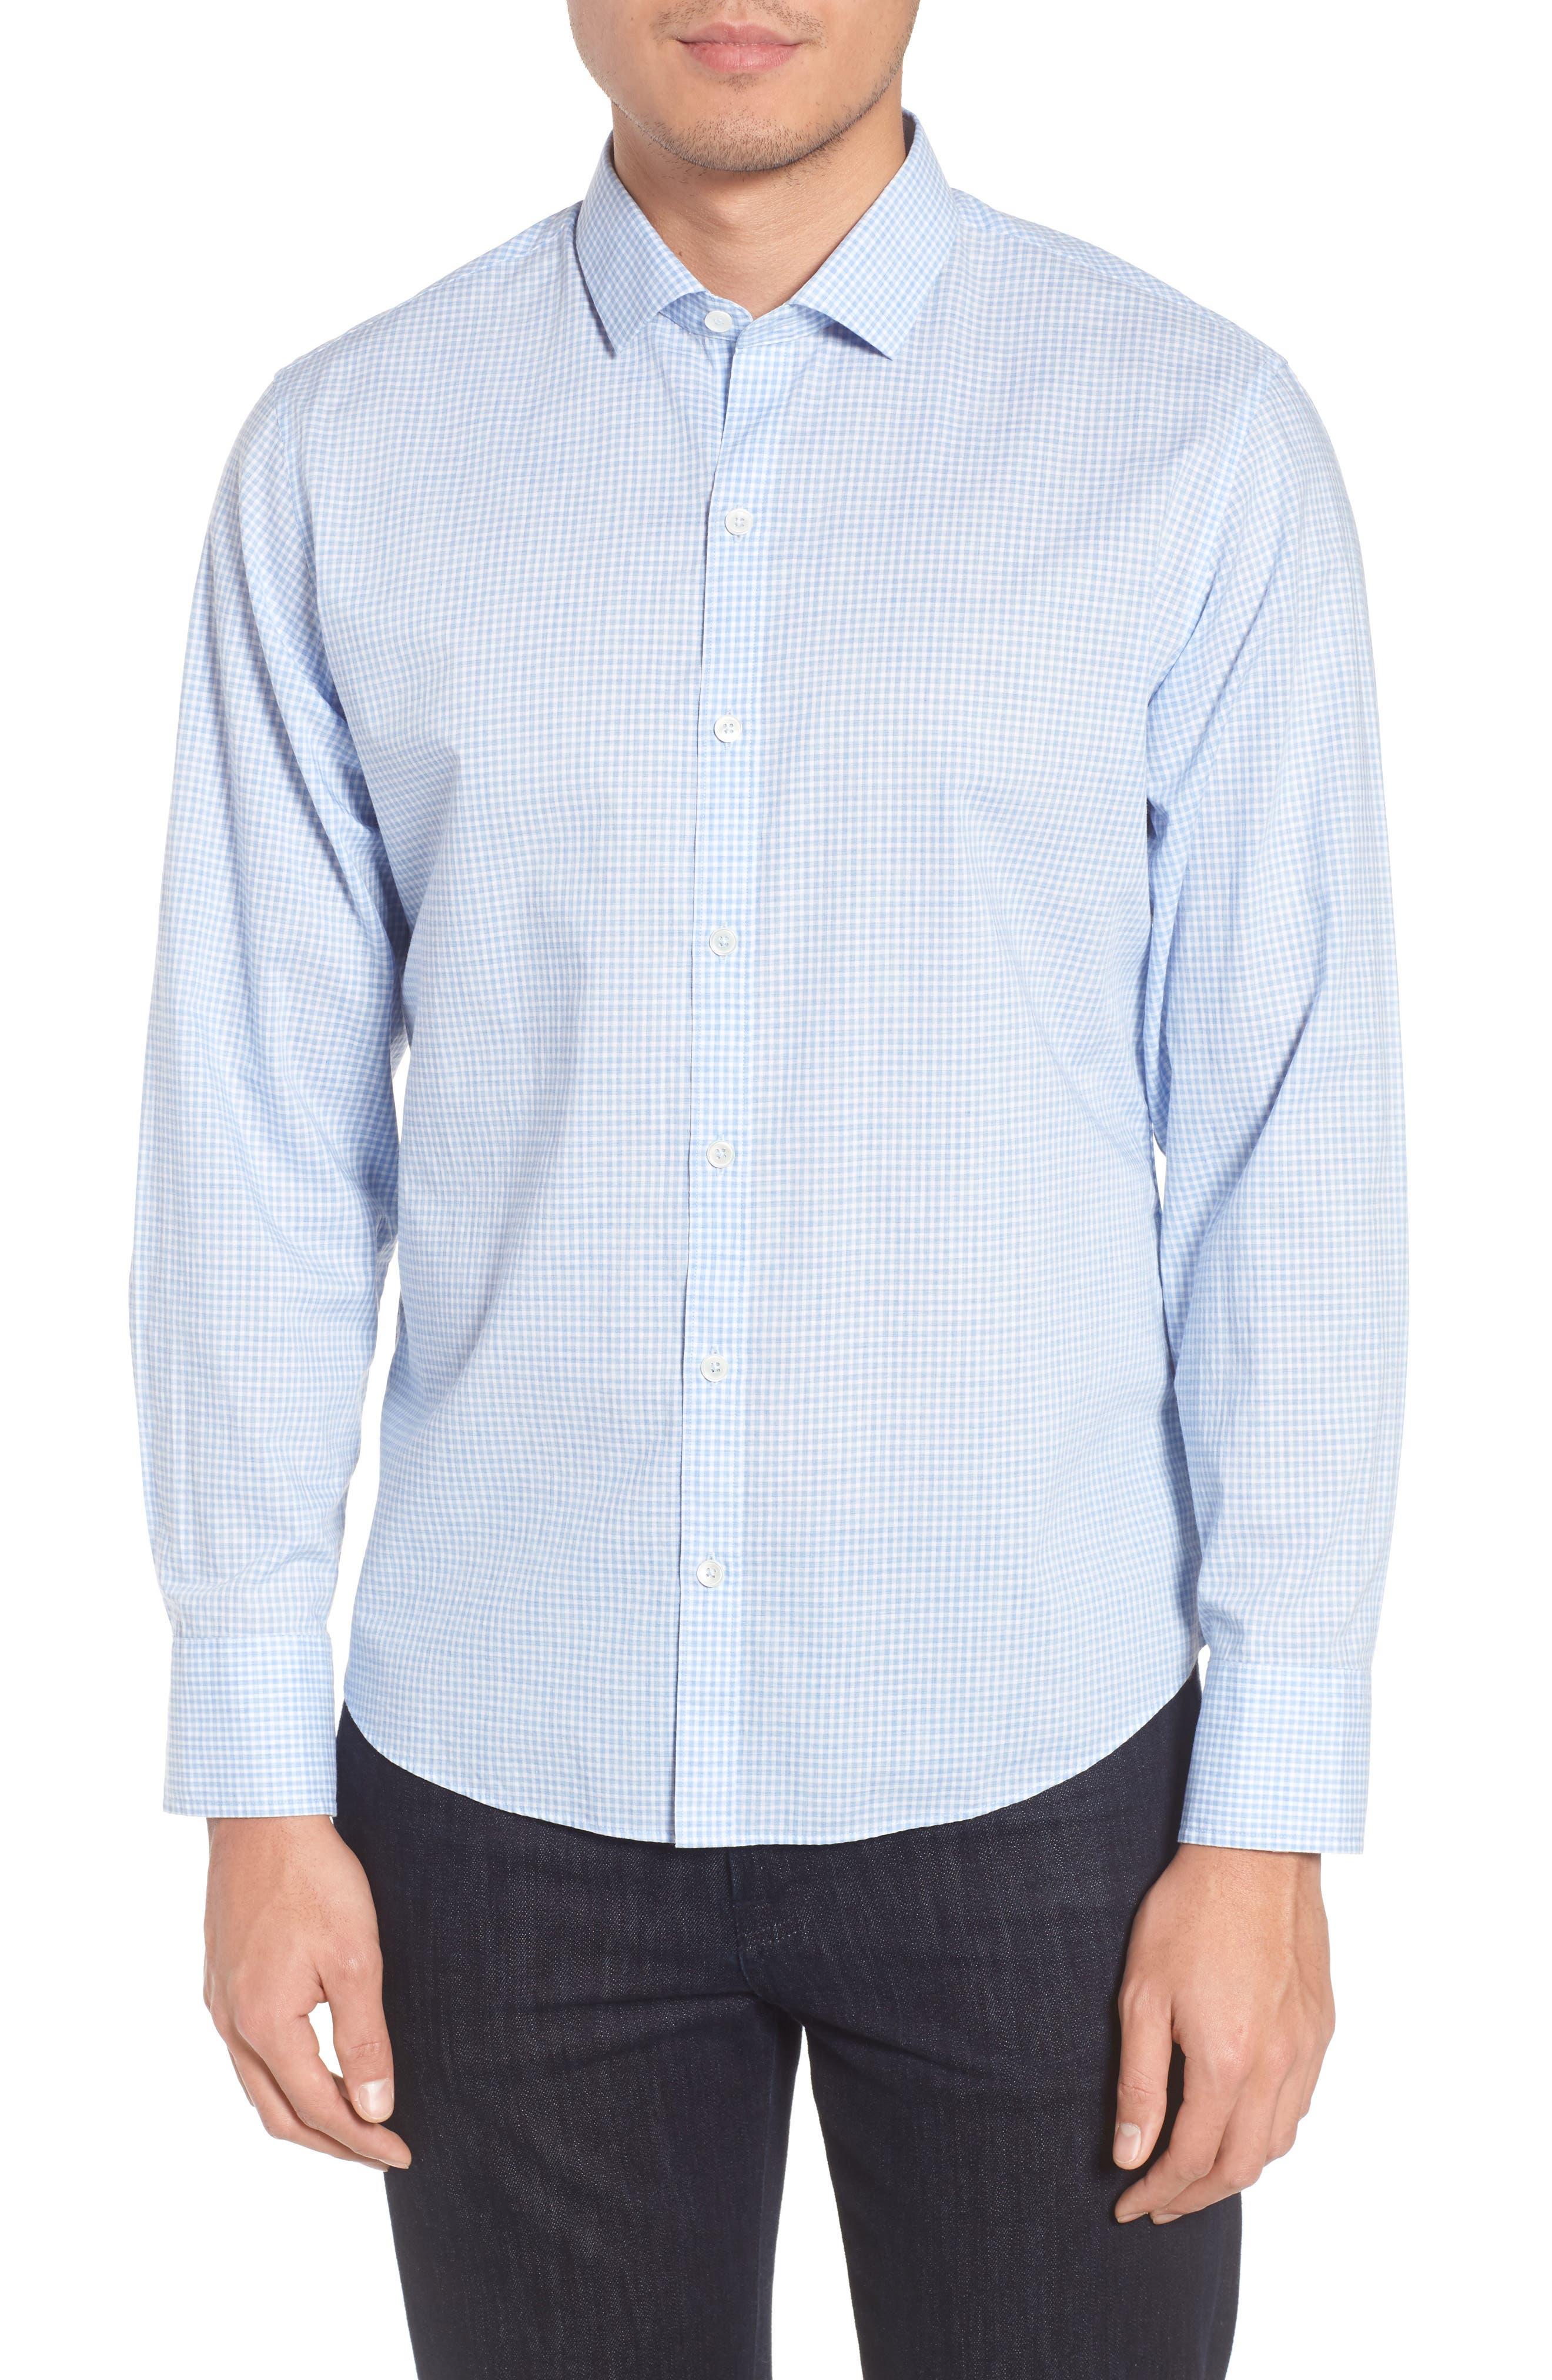 McGarry Gingham Sport Shirt,                         Main,                         color, Light Blue